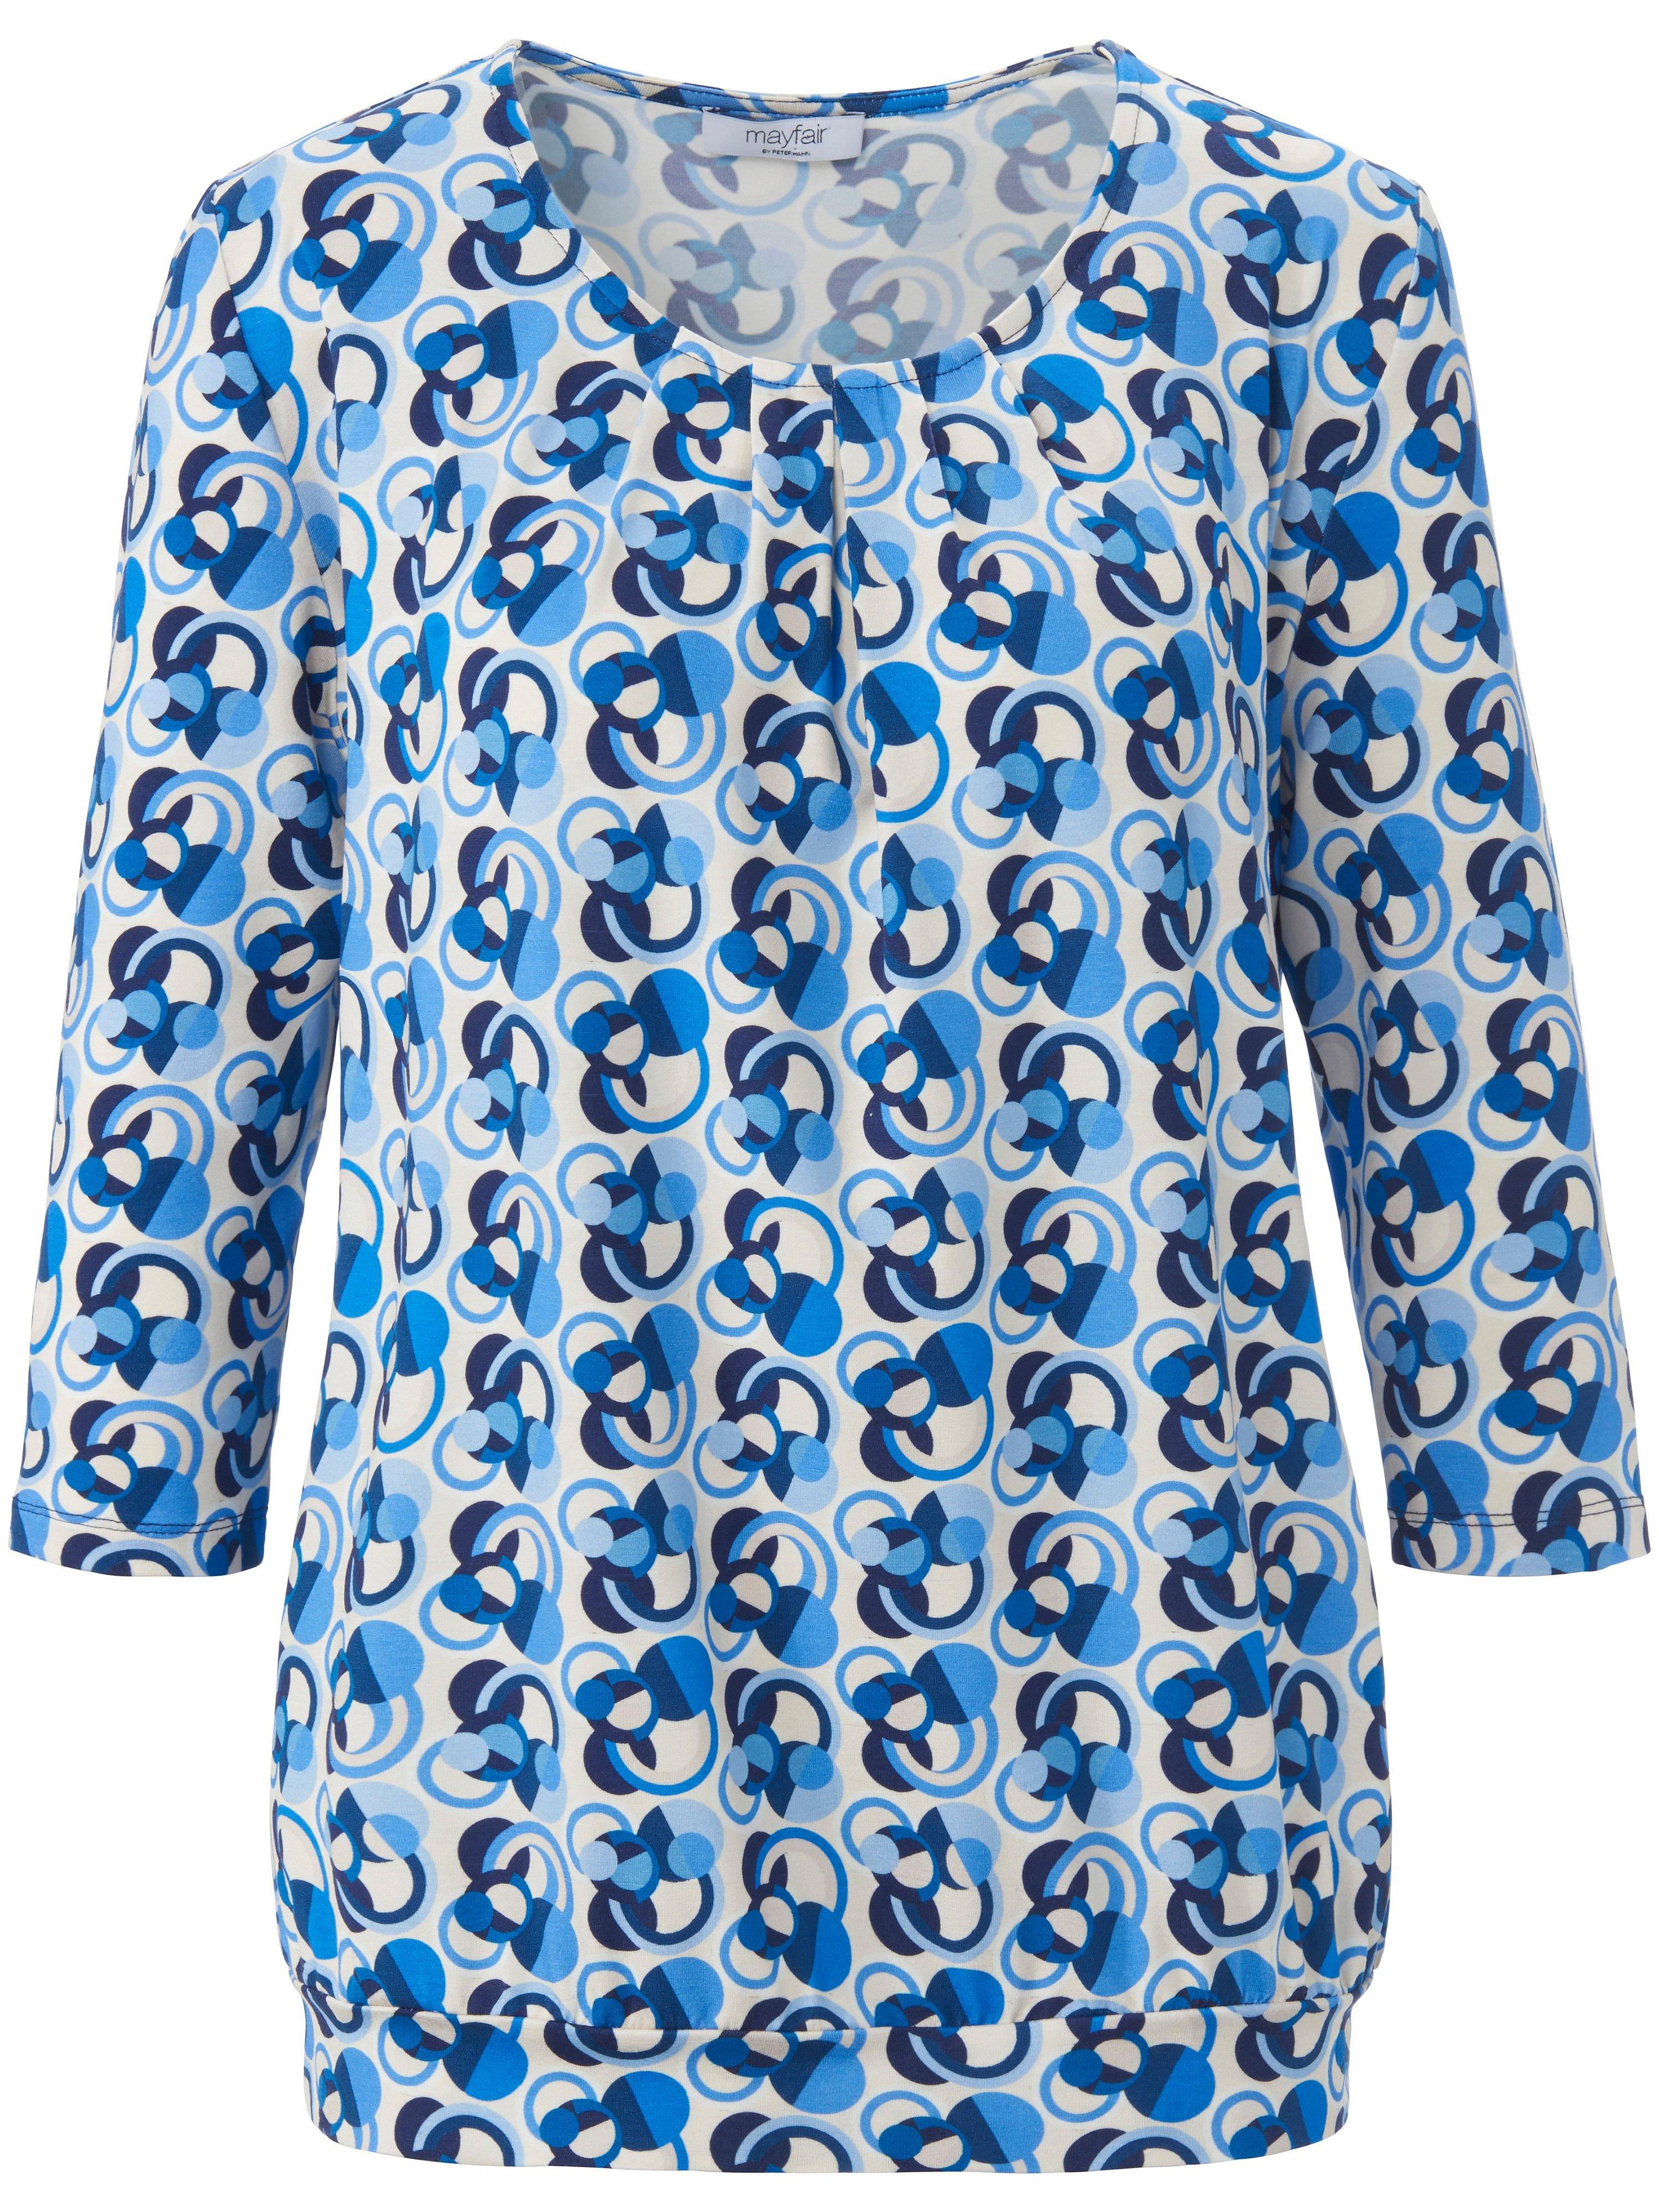 Shirt 3/4-mouwen en ronde hals Van mayfair by Peter Hahn multicolour